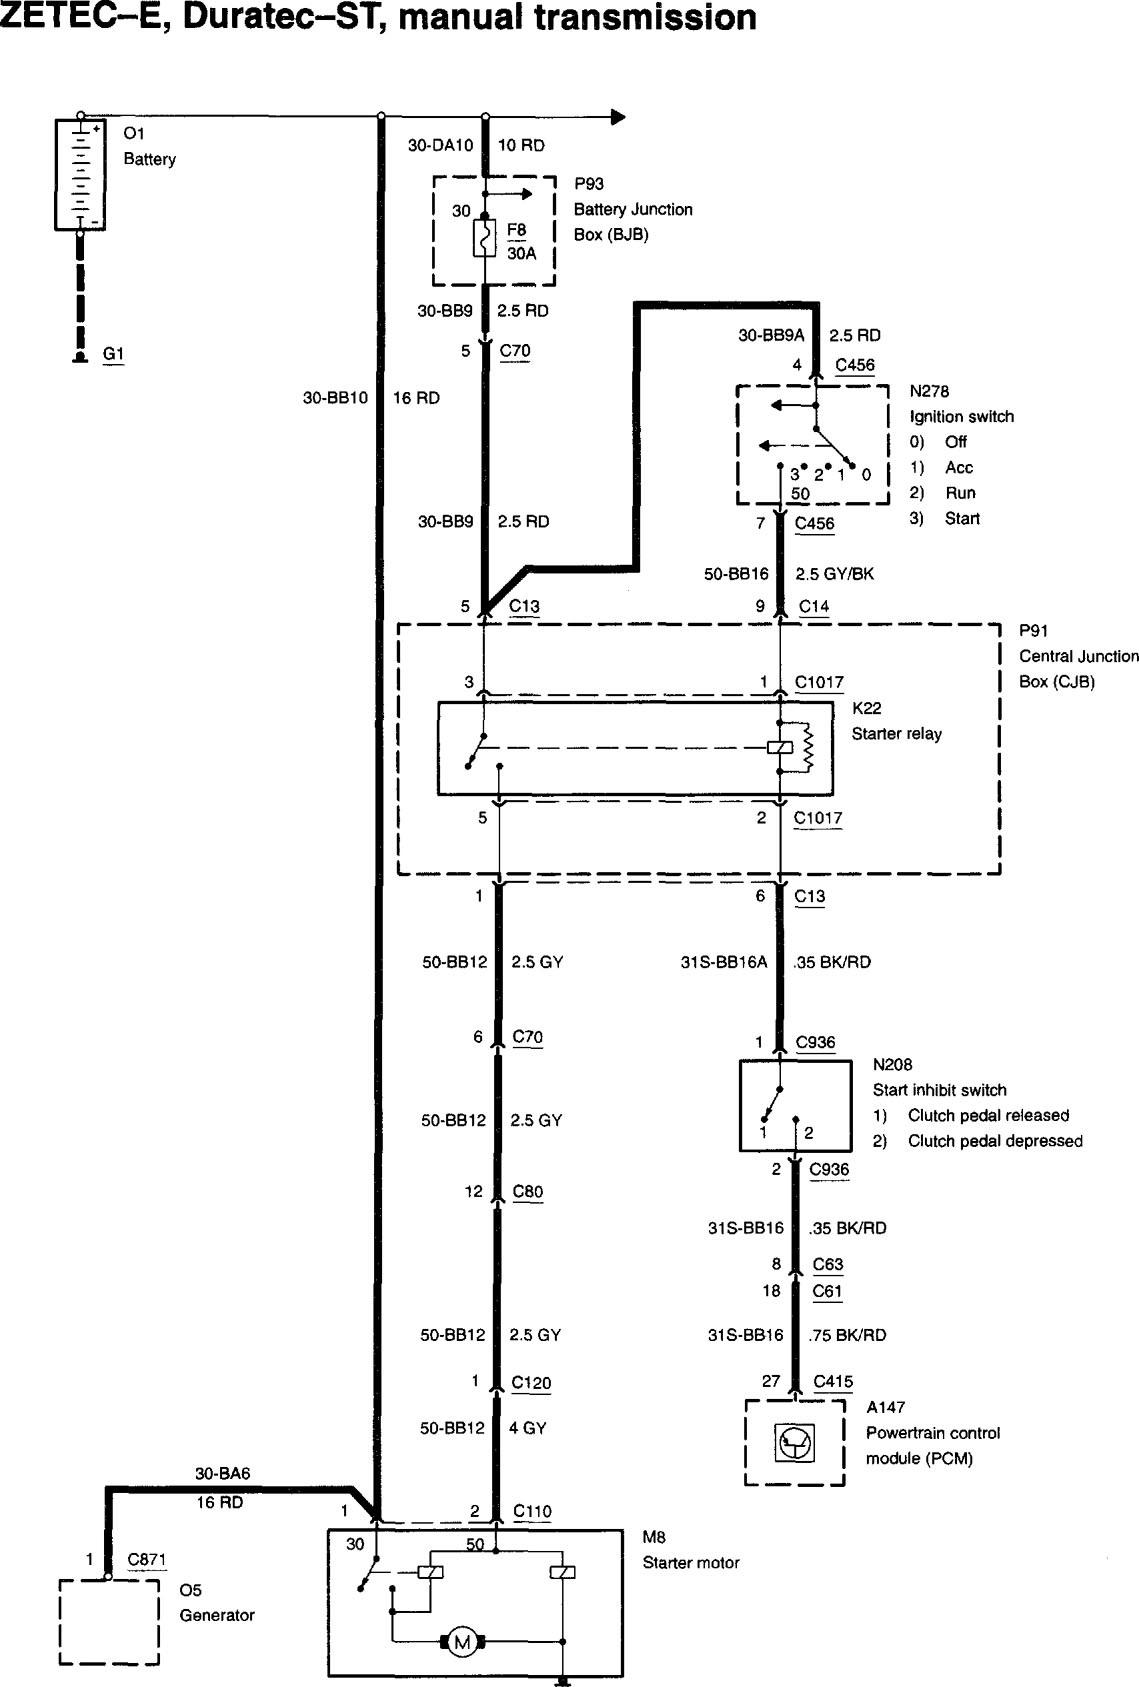 Need Wiring Diagram Focus Manual Trans